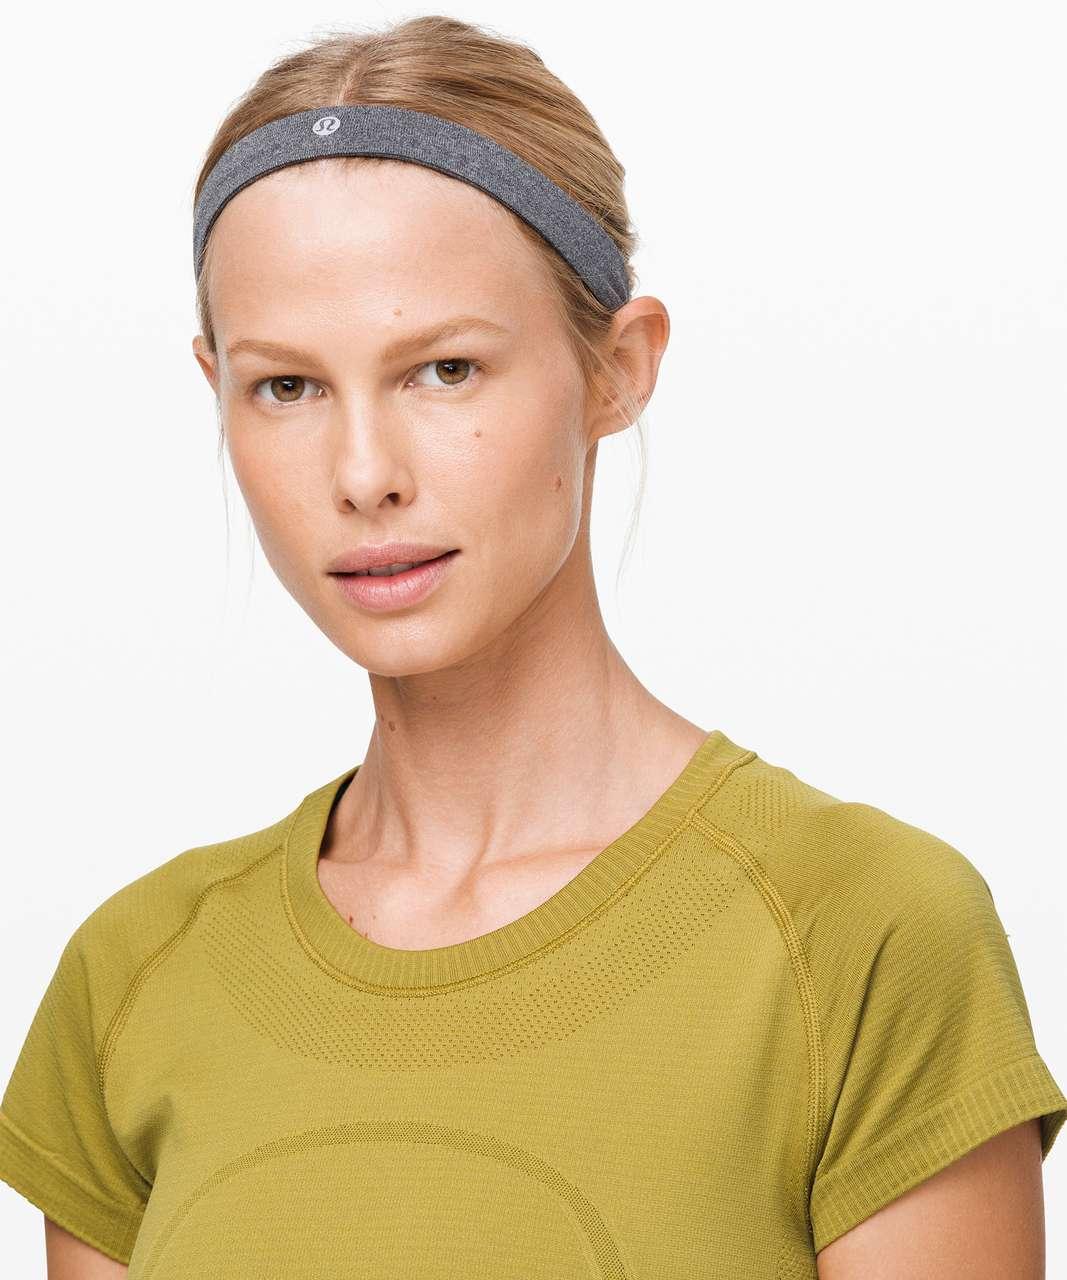 Lululemon Cardio Cross Trainer Headband - Black / White